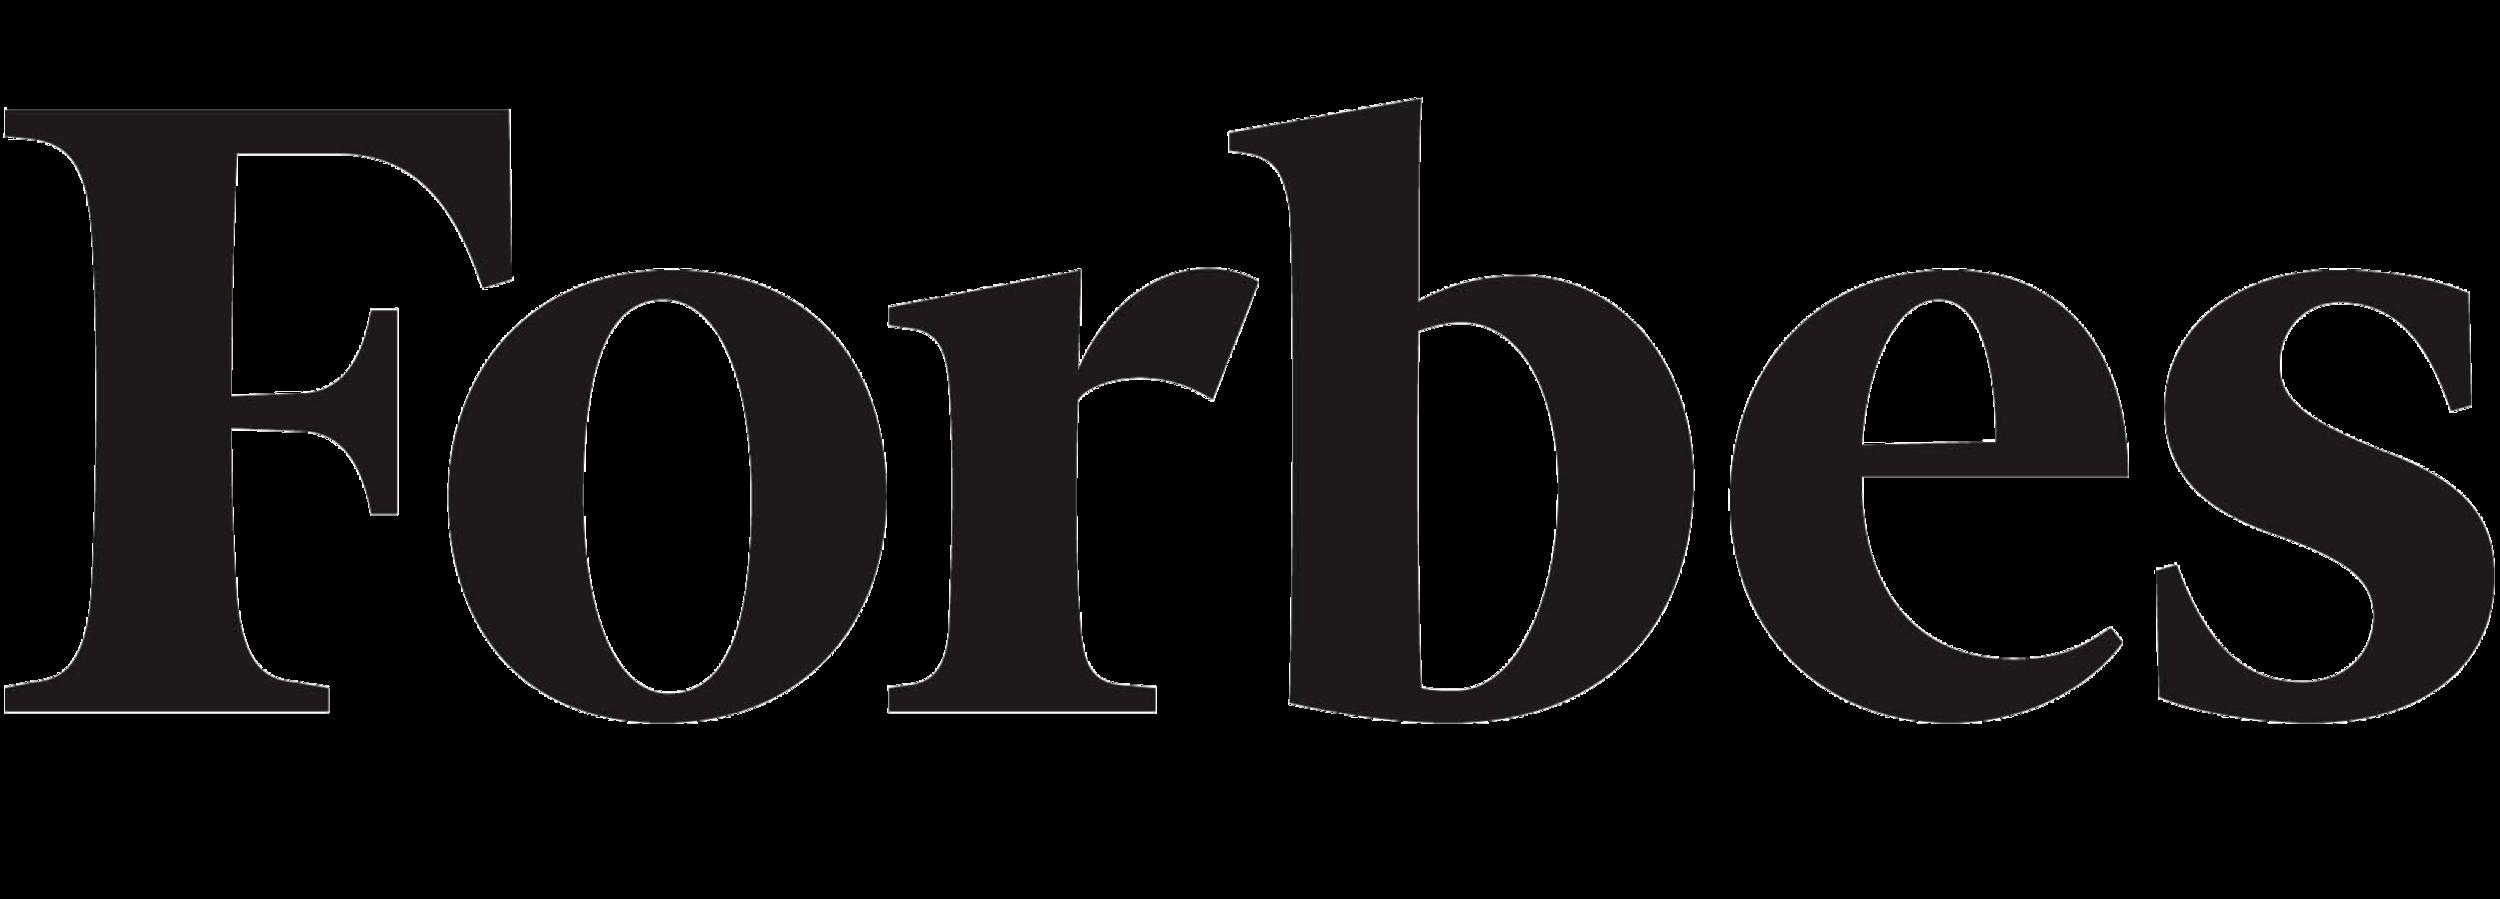 Forbes-Black-Logo-PNG-03003-2-e1517347676630 (1).png